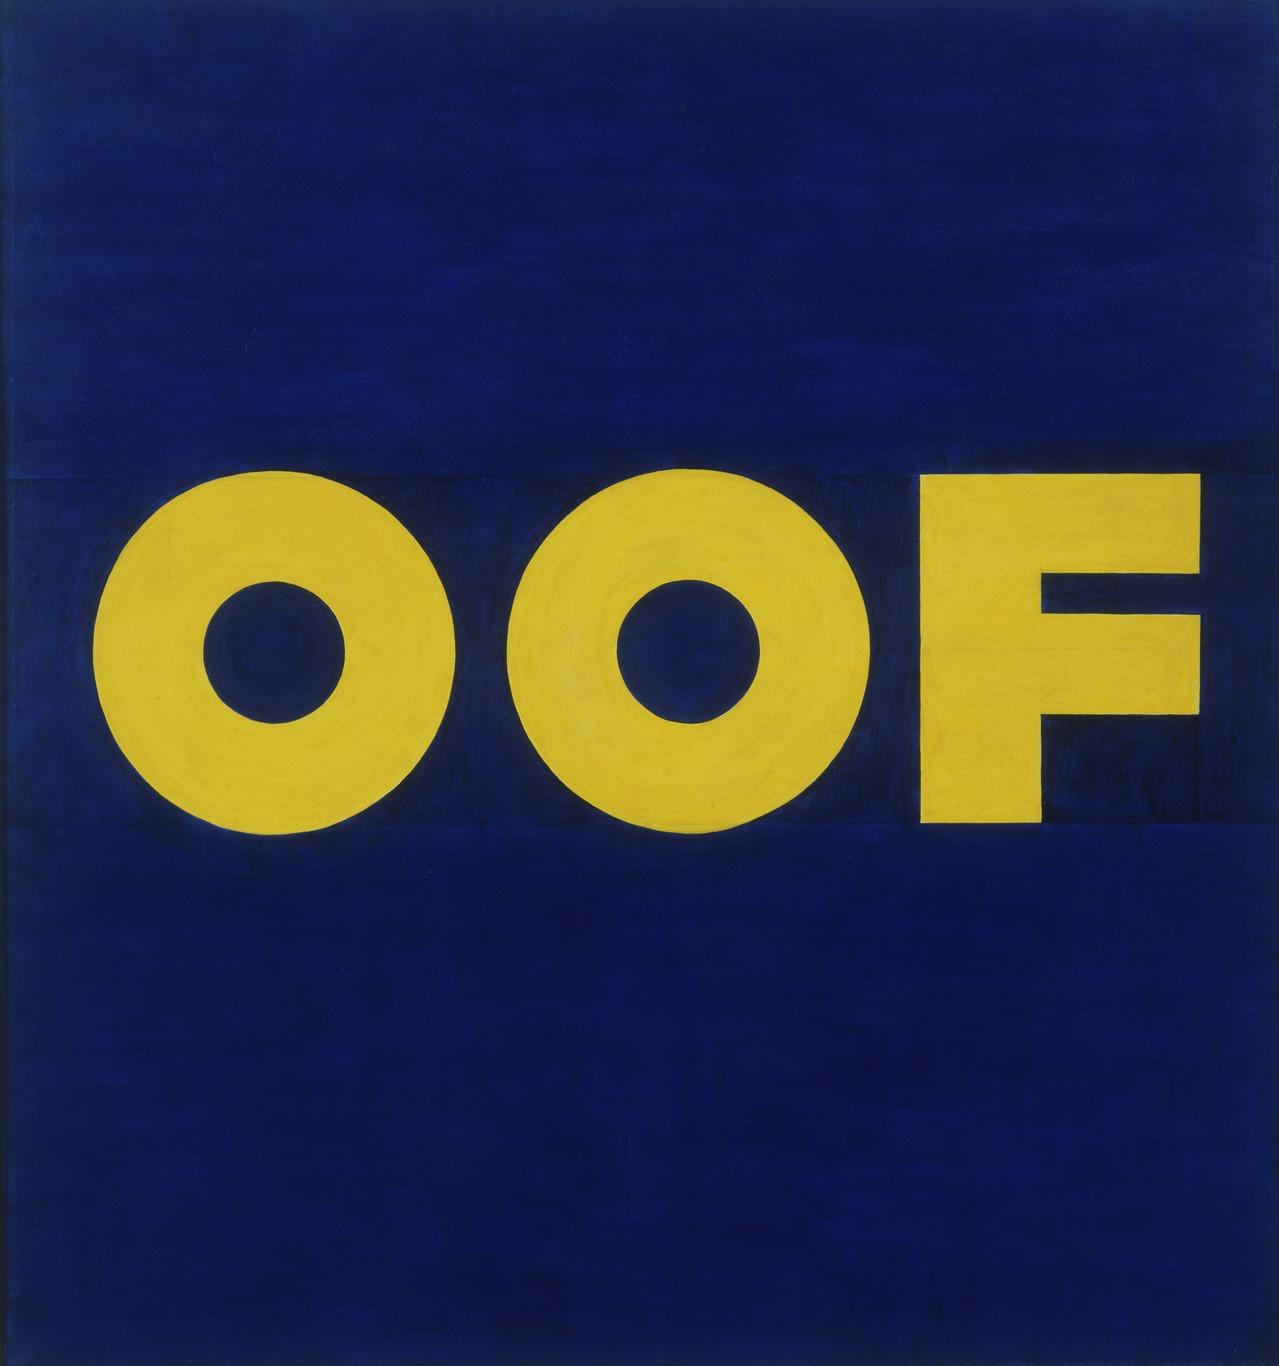 OOF [Edward Ruscha]   Sartle - Rogue Art History